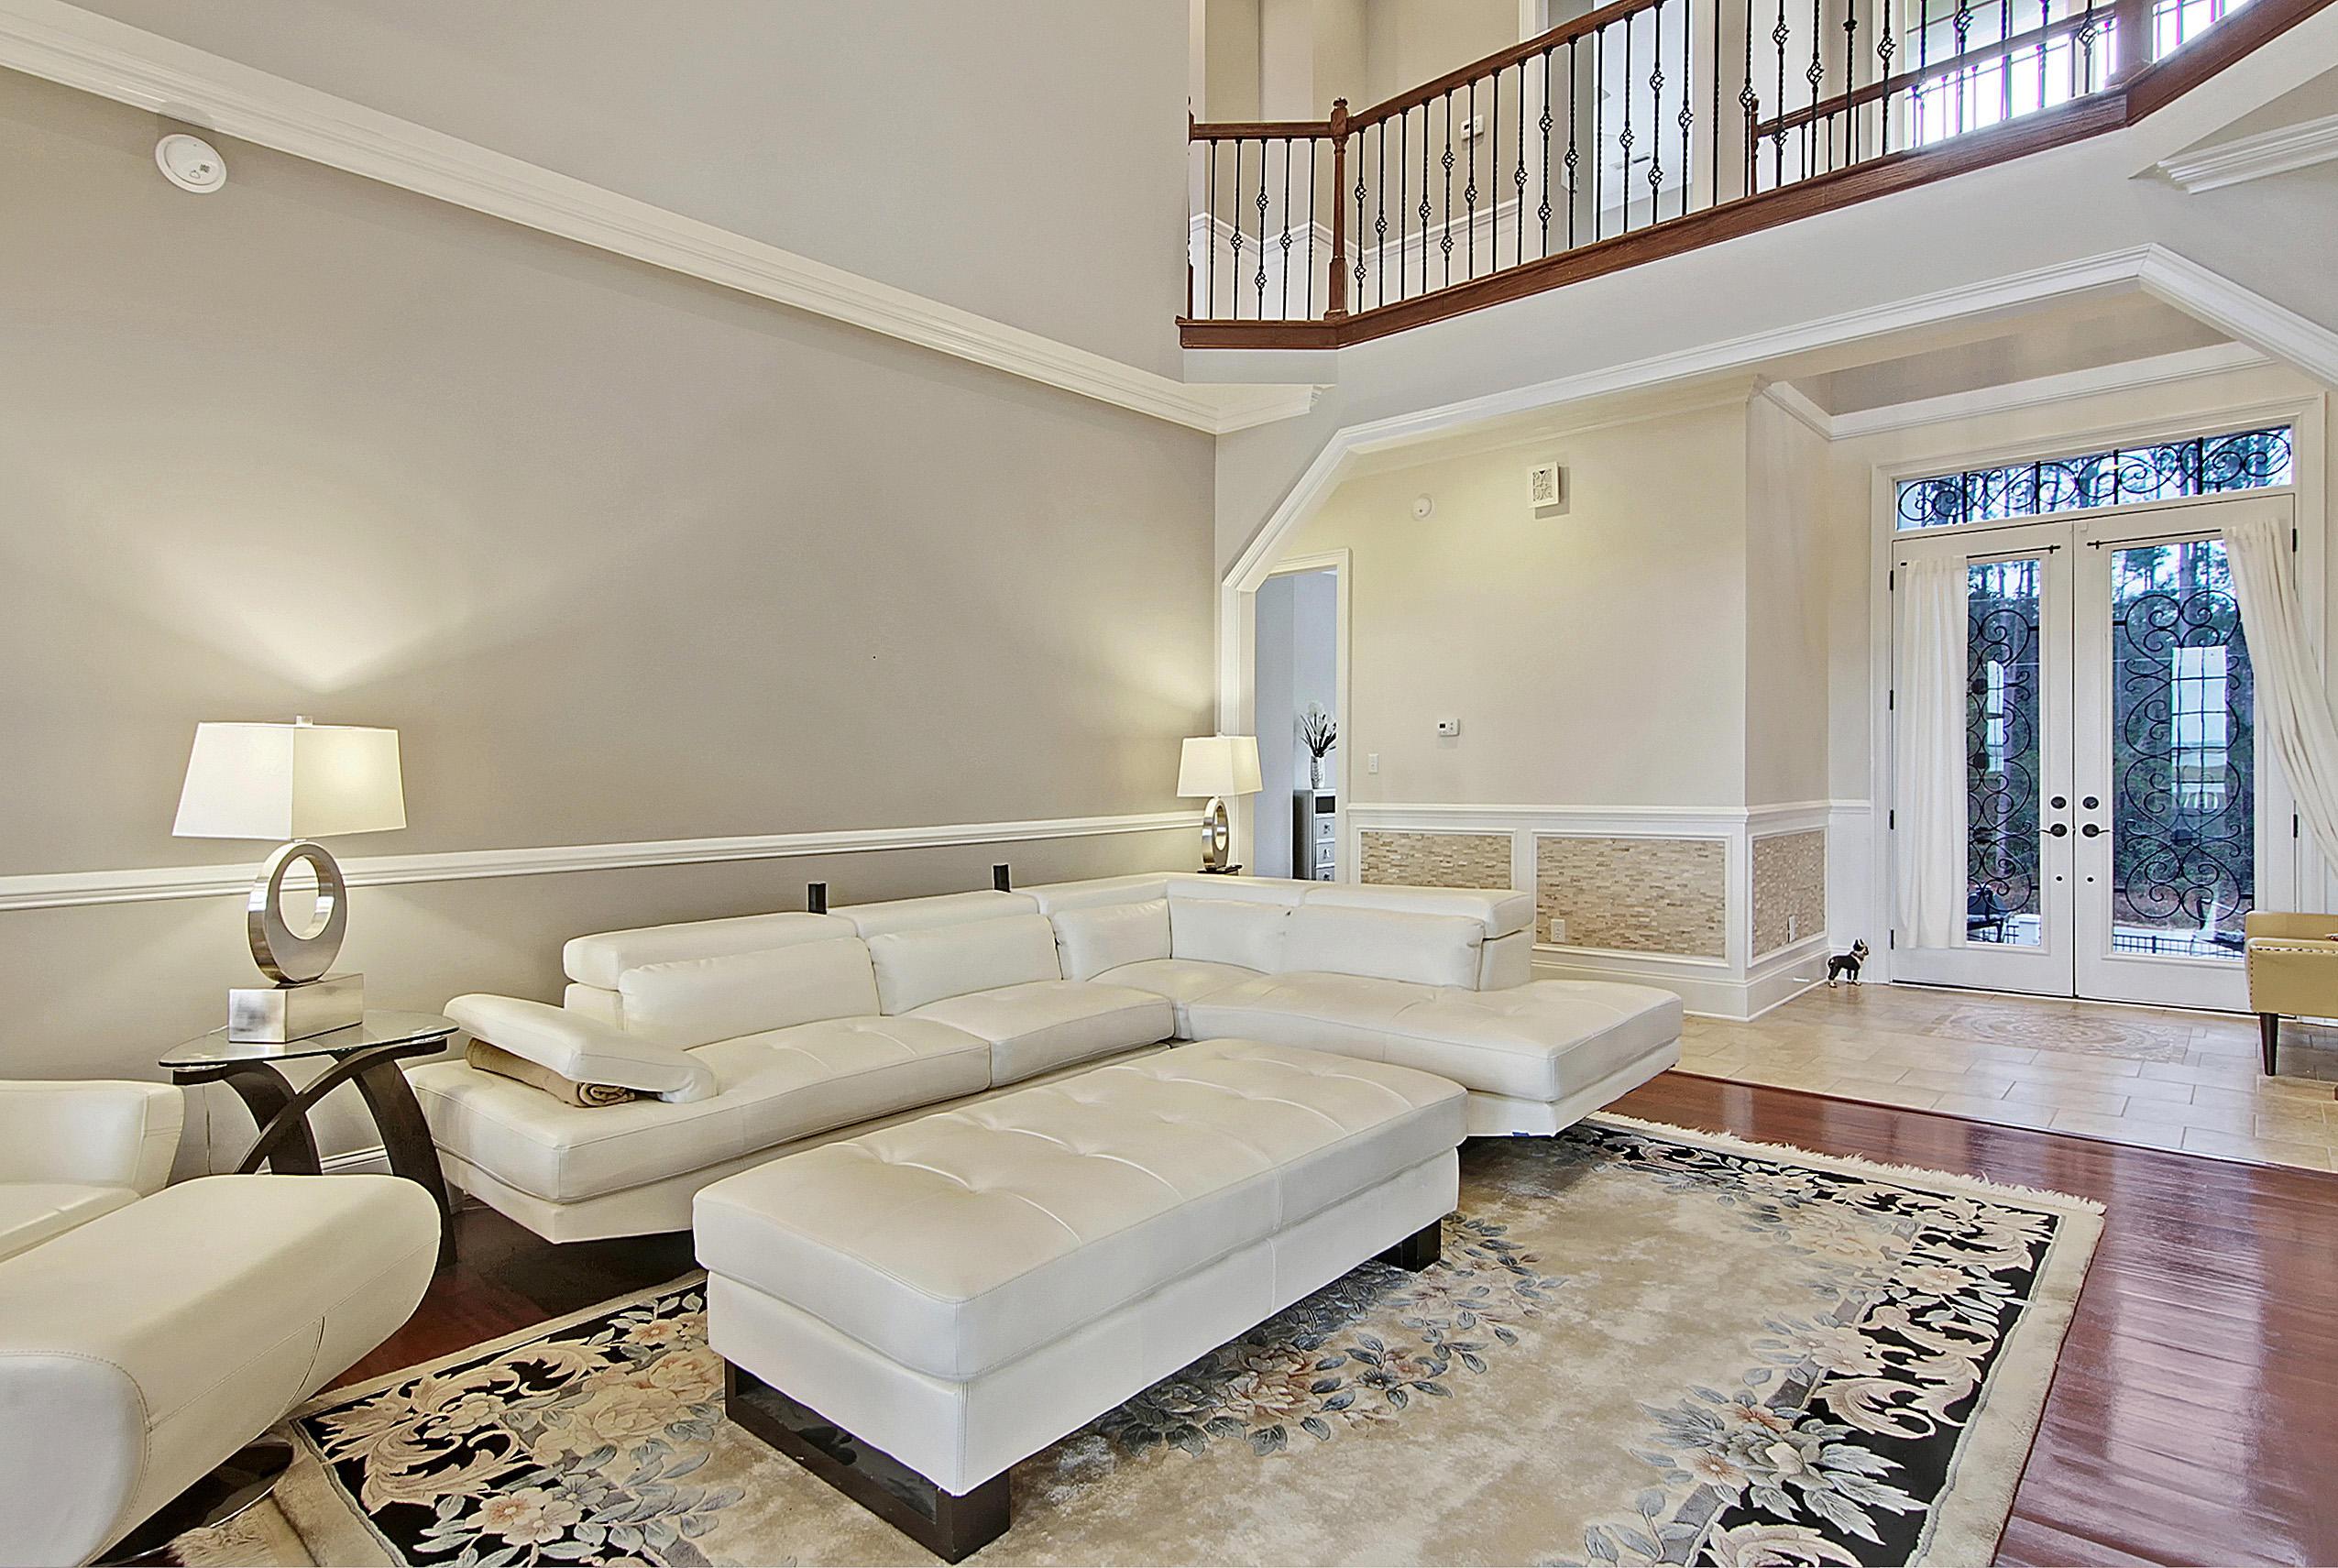 Hamlin Beach Homes For Sale - 2797 Hamlin Beach, Mount Pleasant, SC - 19